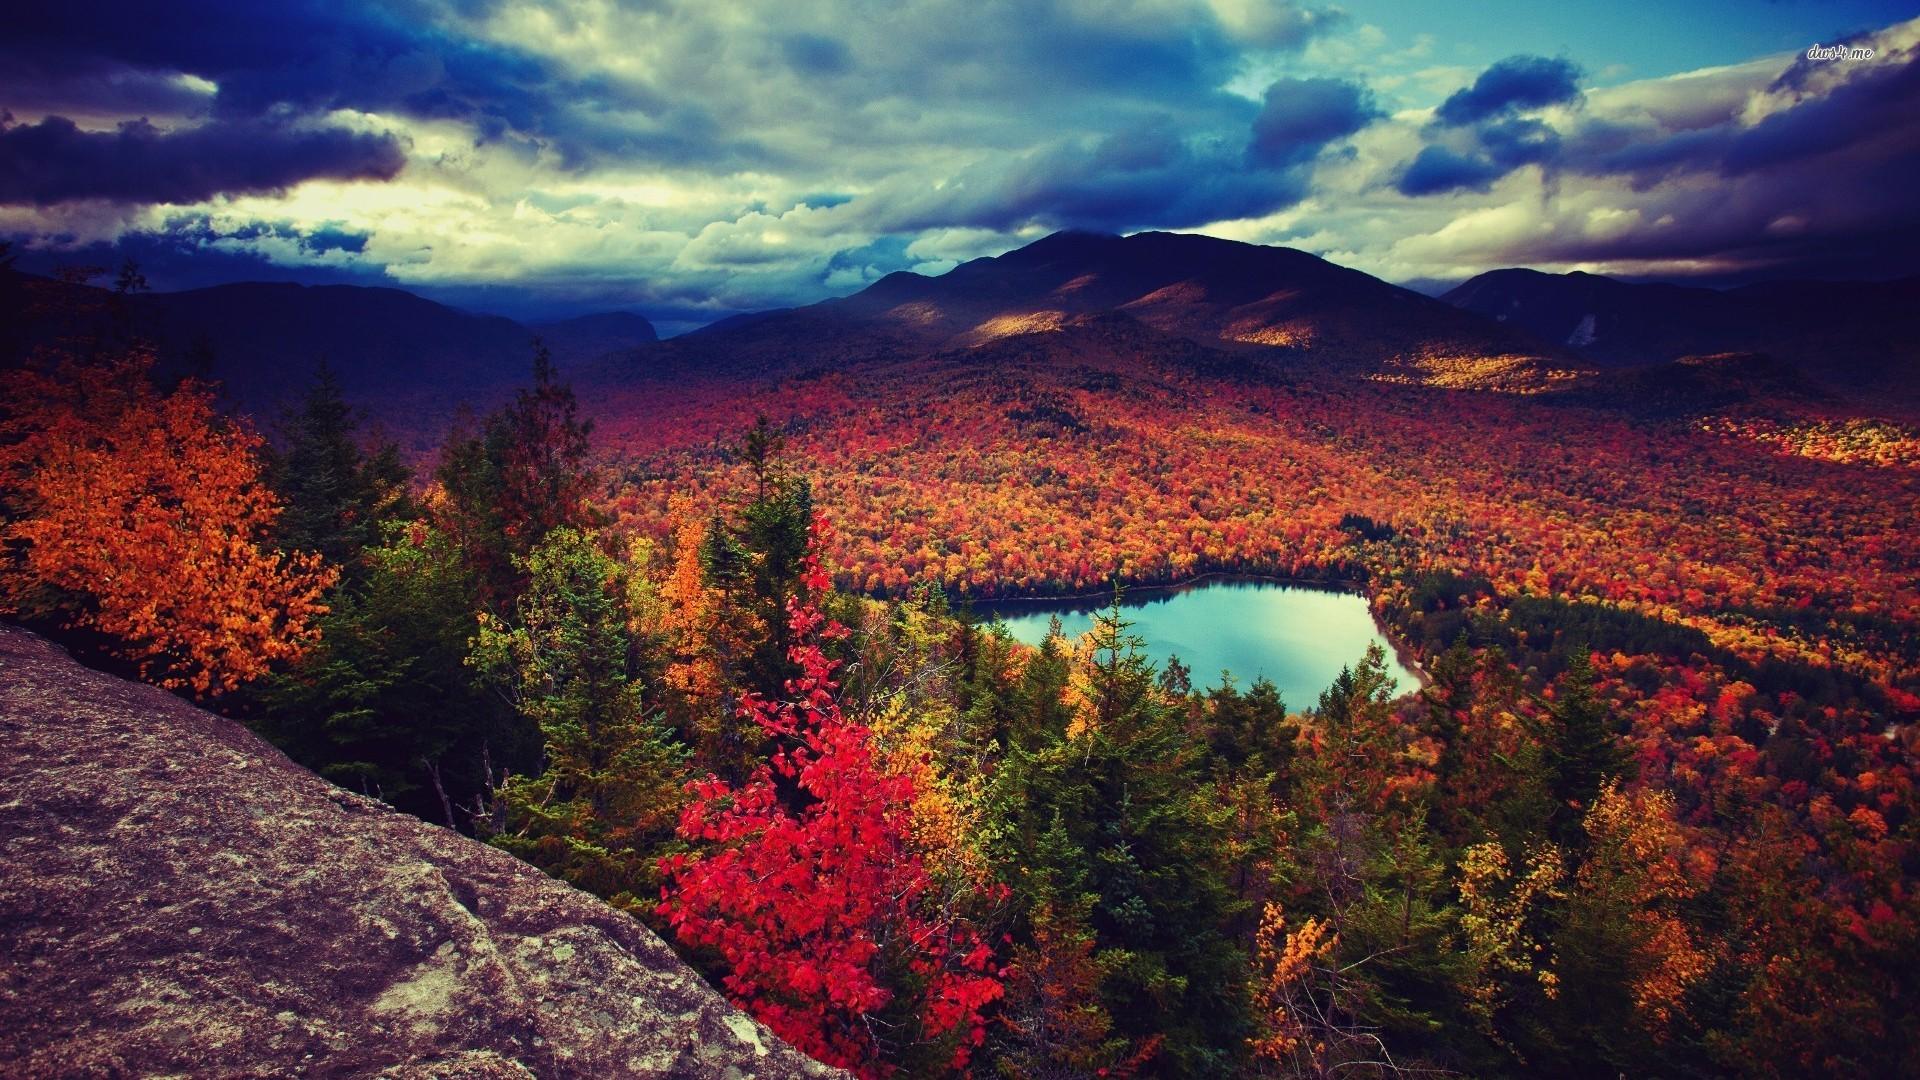 Fall Mountain Wallpapers Desktop Background : Nature Wallpaper